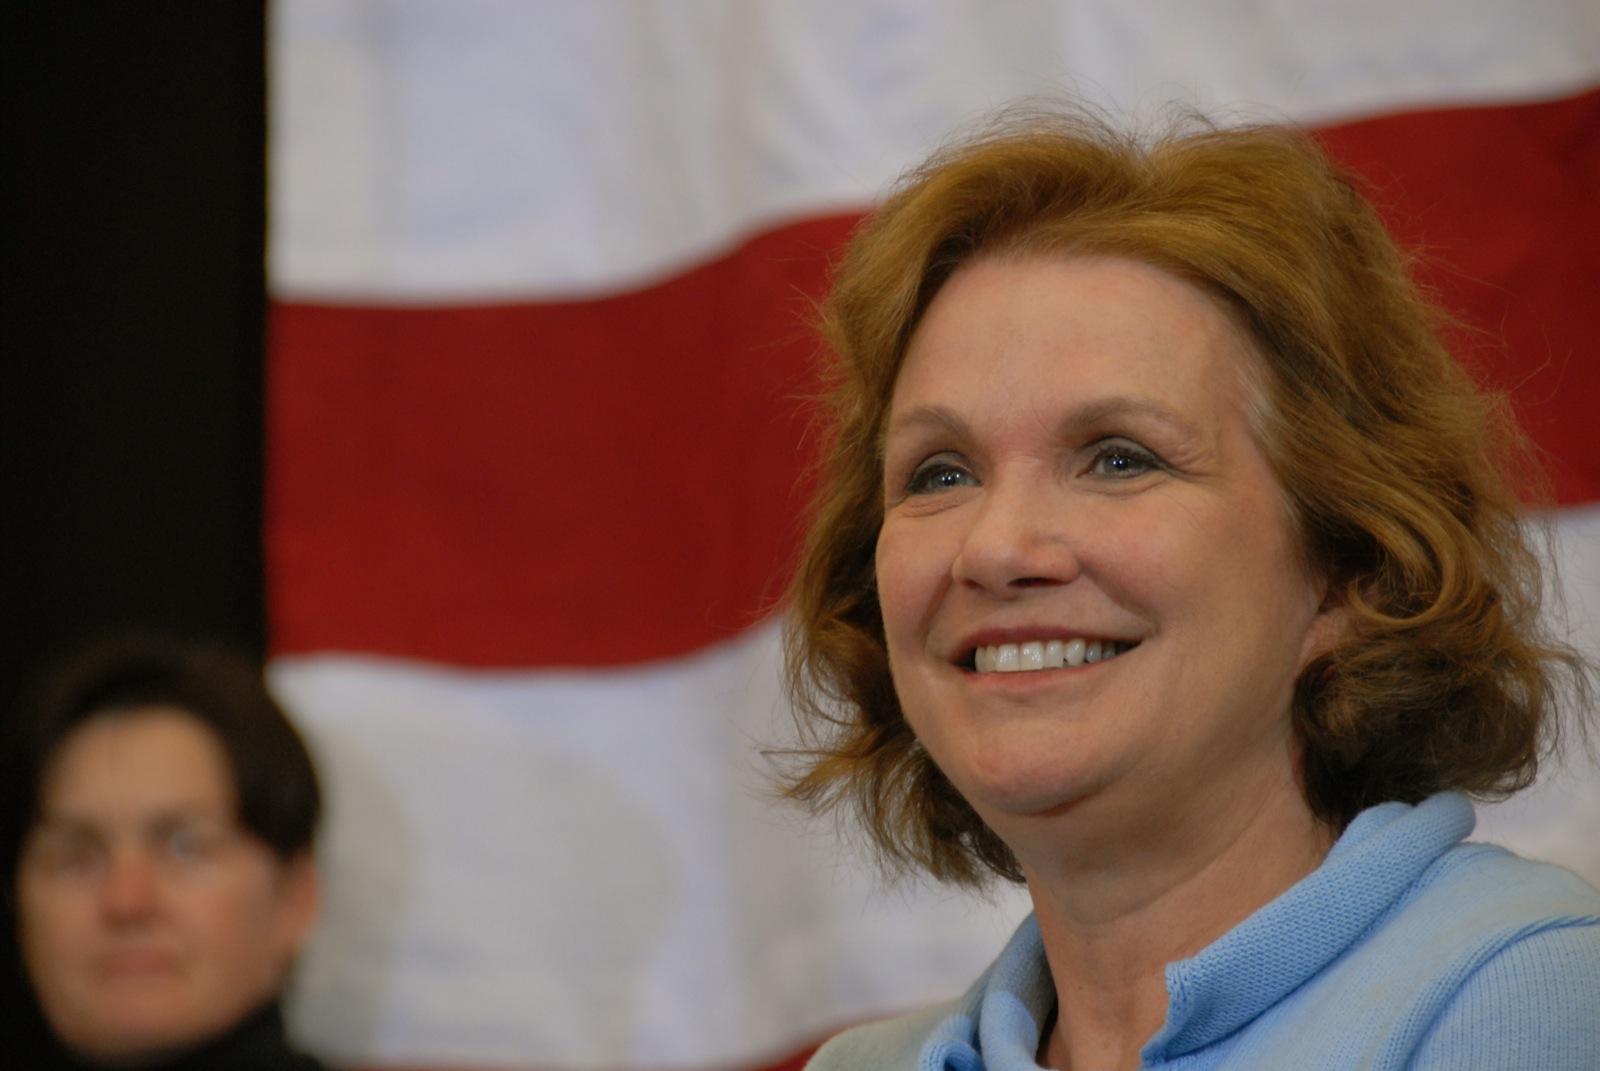 Elizabeth Edwards posing in from of American Flag